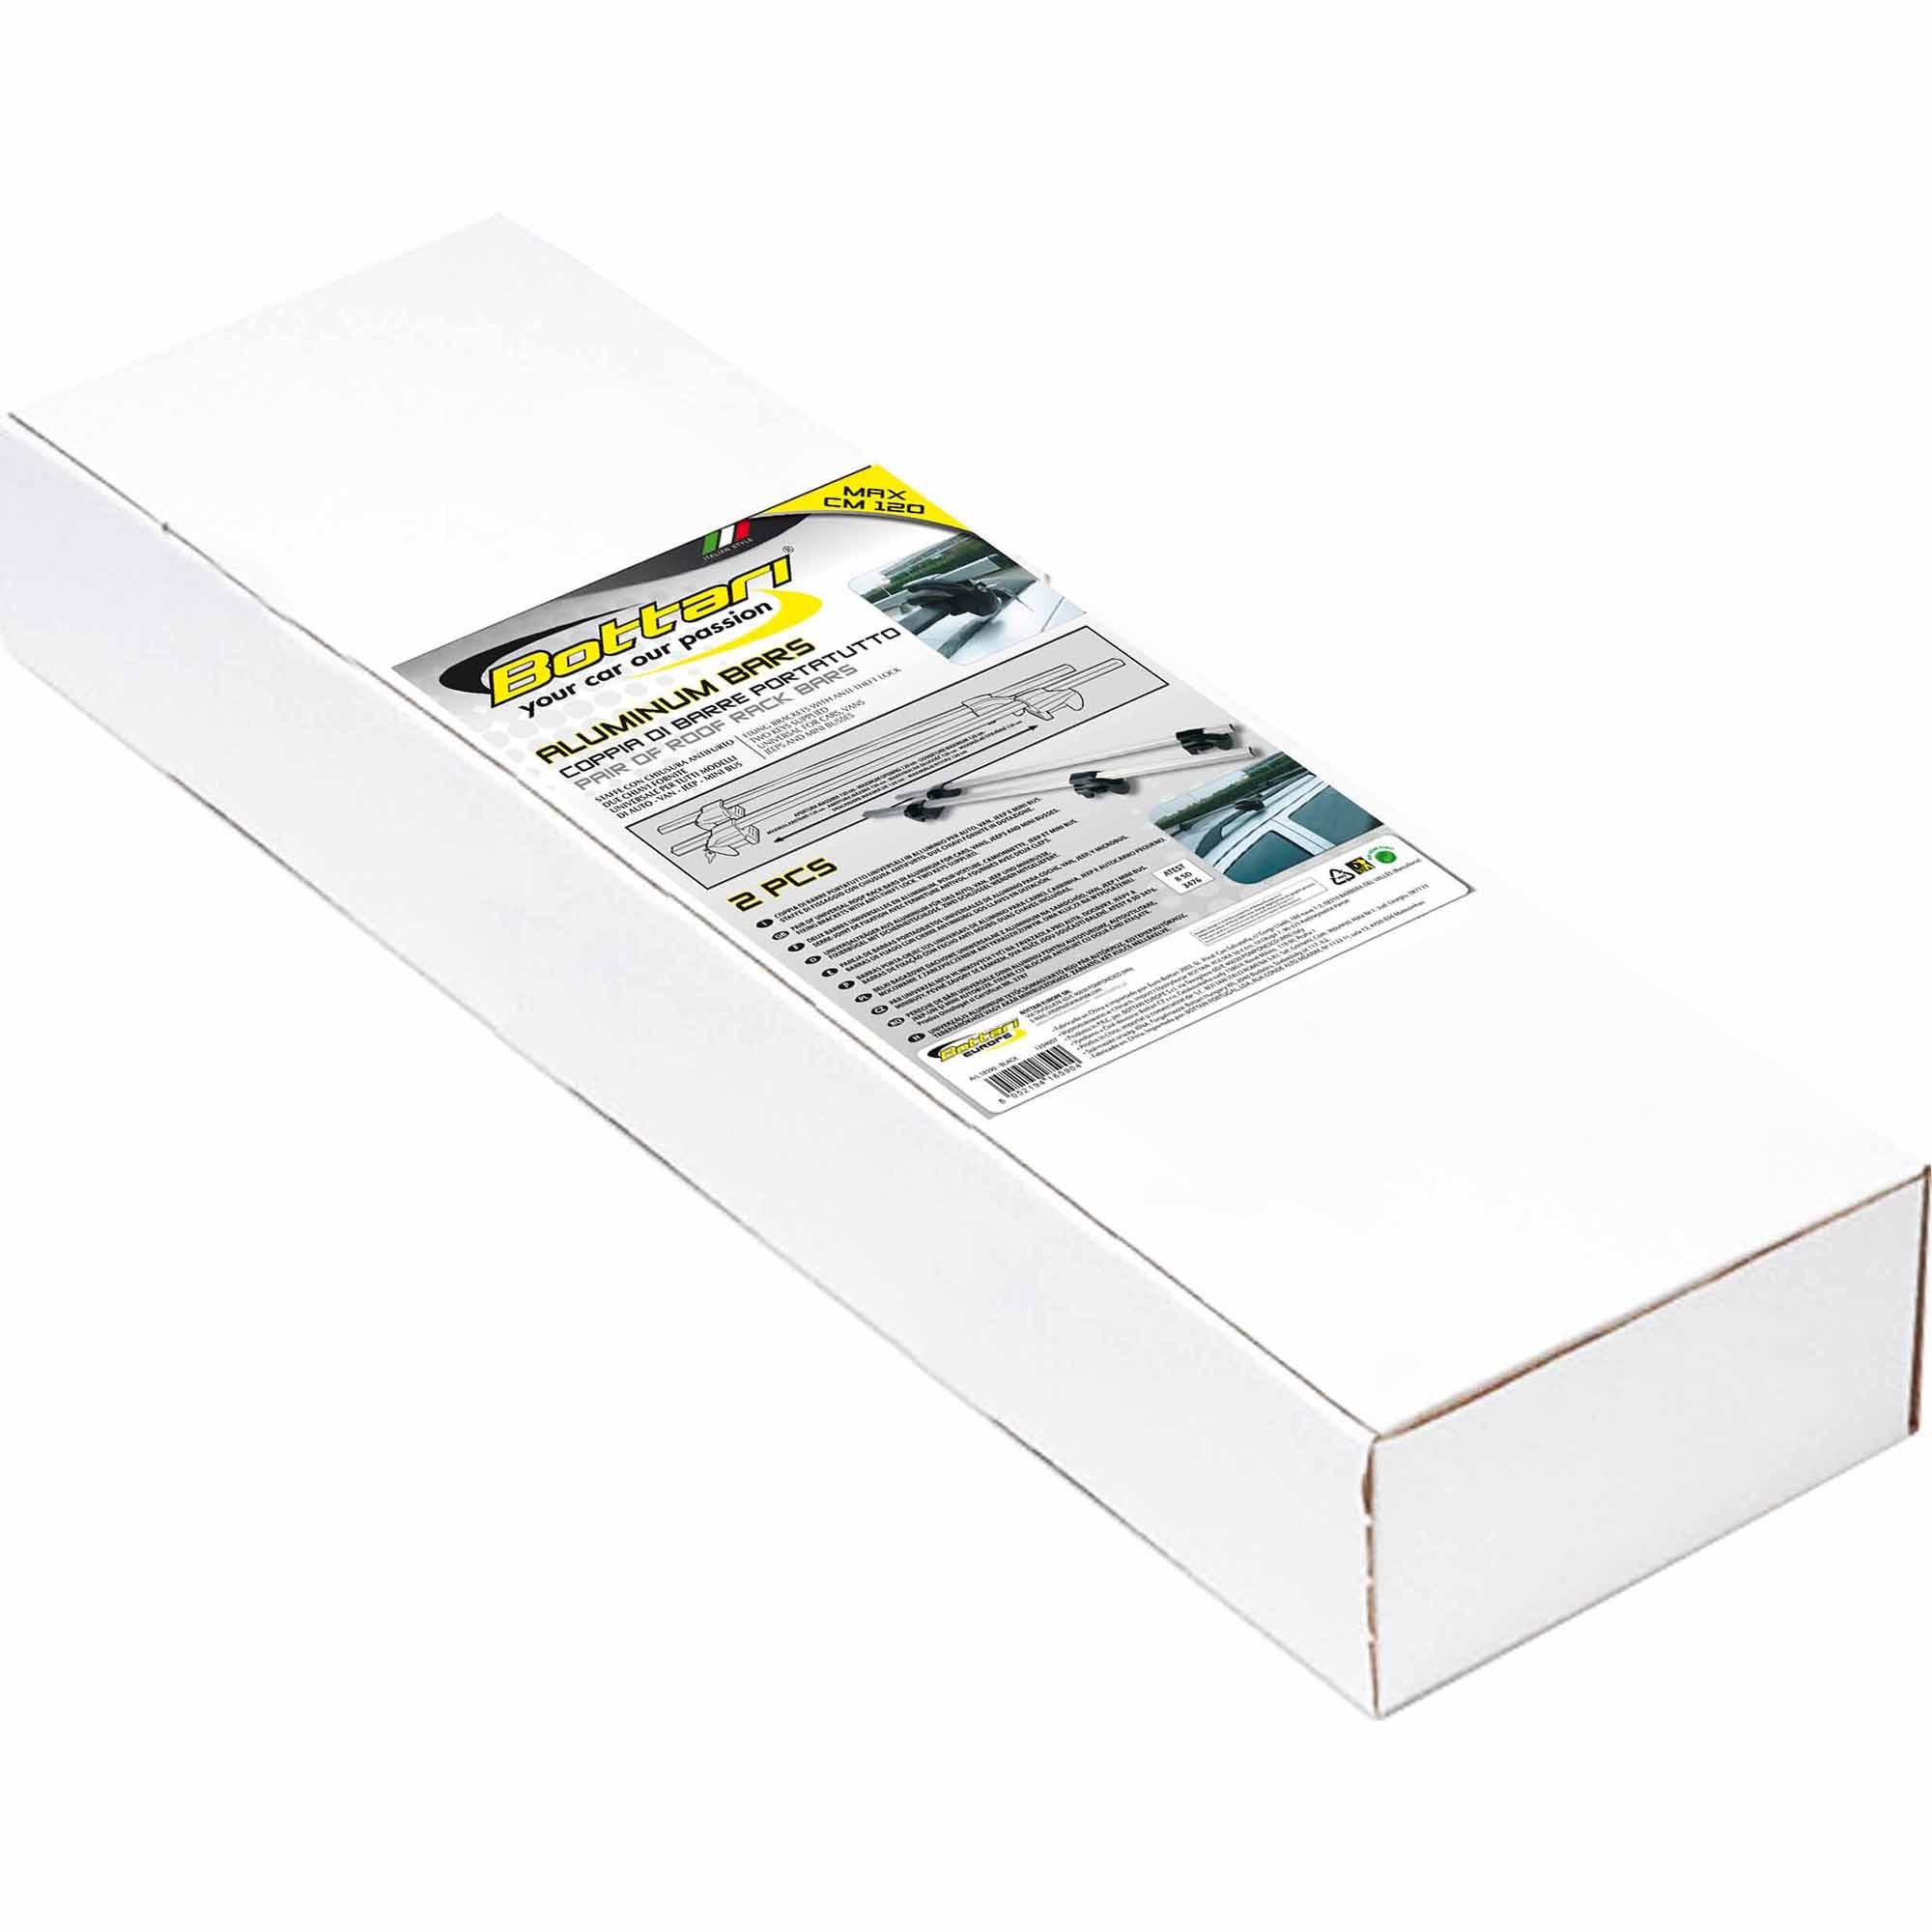 Fotografie Bare transversale universale Bottari Aluminium Bars, aluminiu/negru